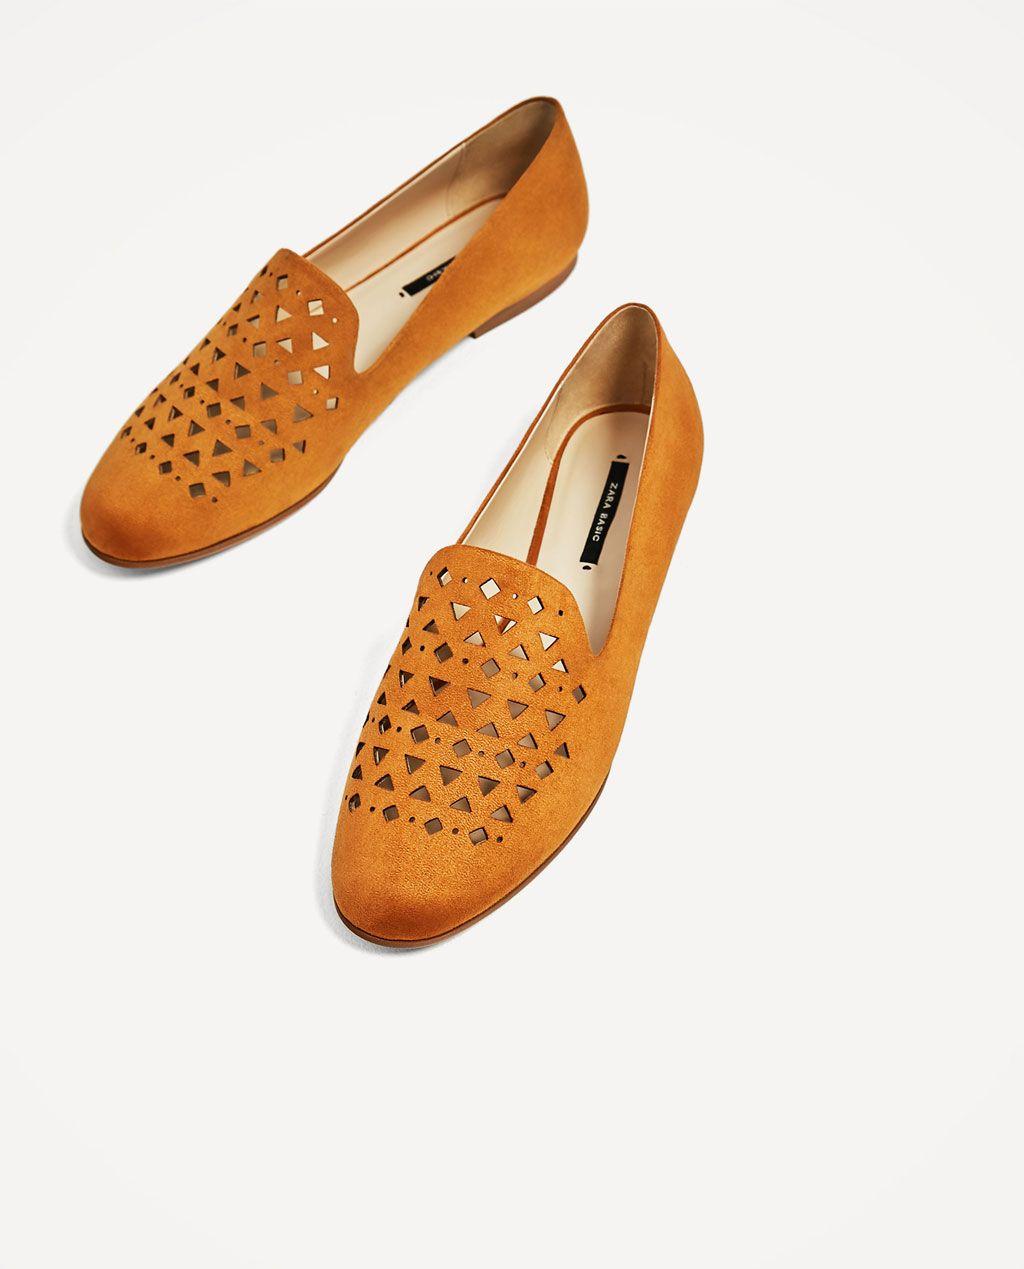 Dream 19 Plano Fashion Detalle Eur Zapato Troquelado 95 Zara tq8wnOHd